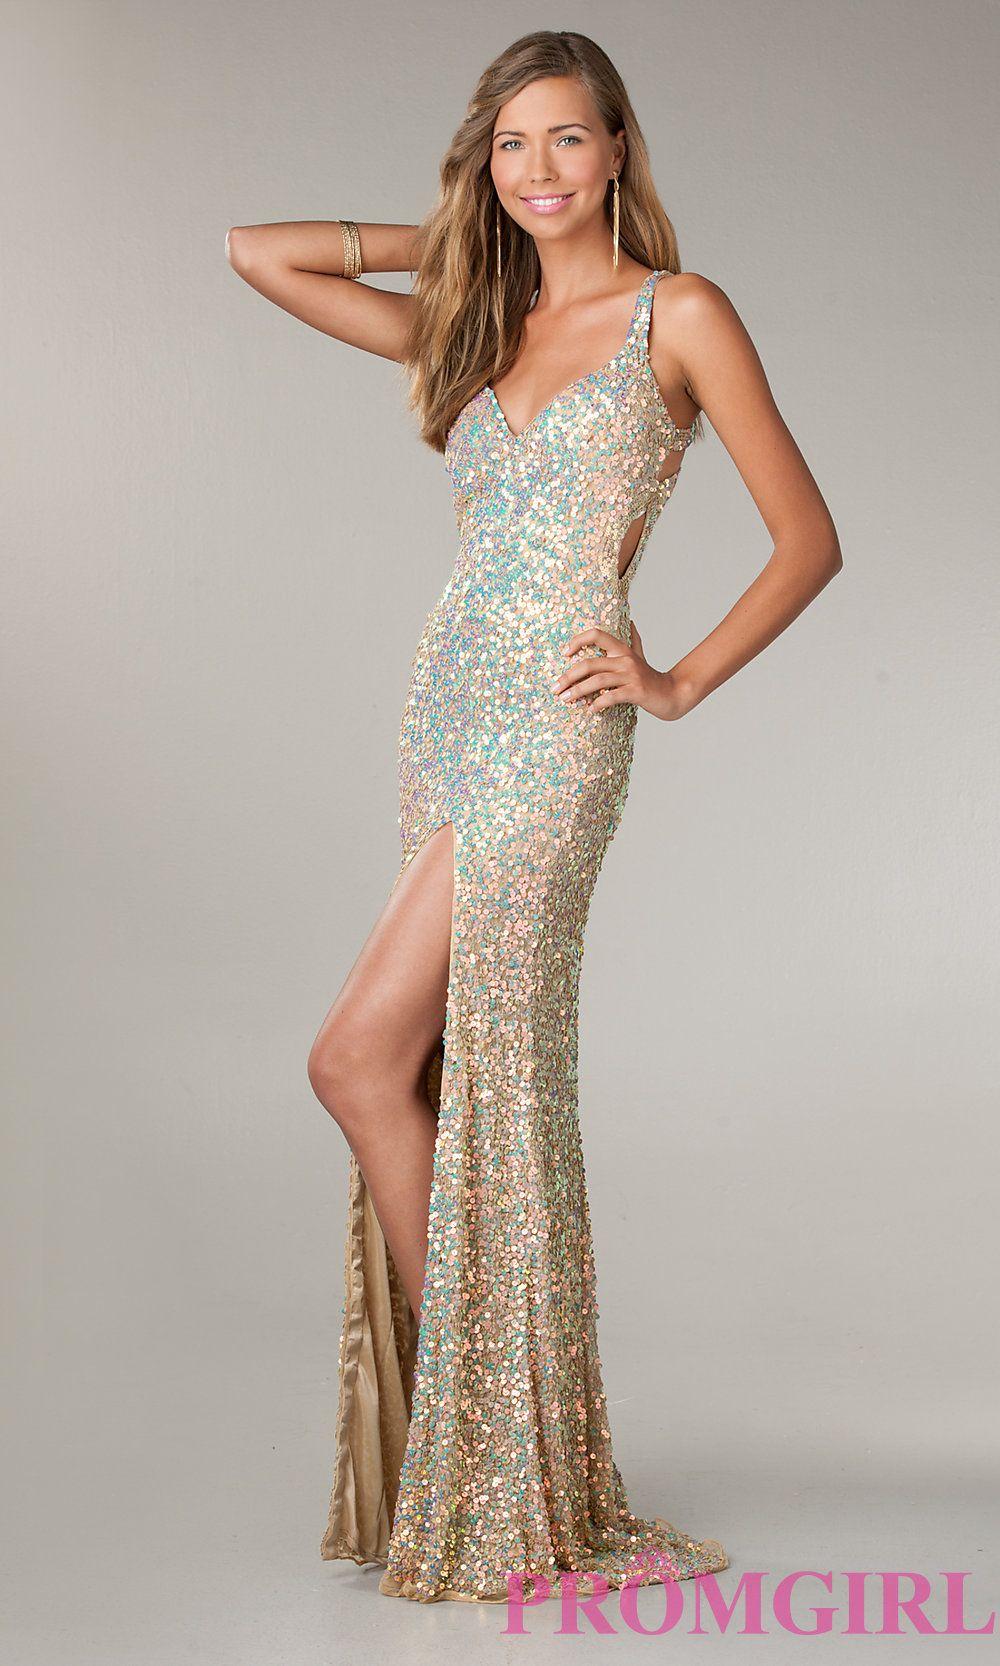 Primavera V Neck Sequin Prom Dress Sequin Evening Gown Promgirl